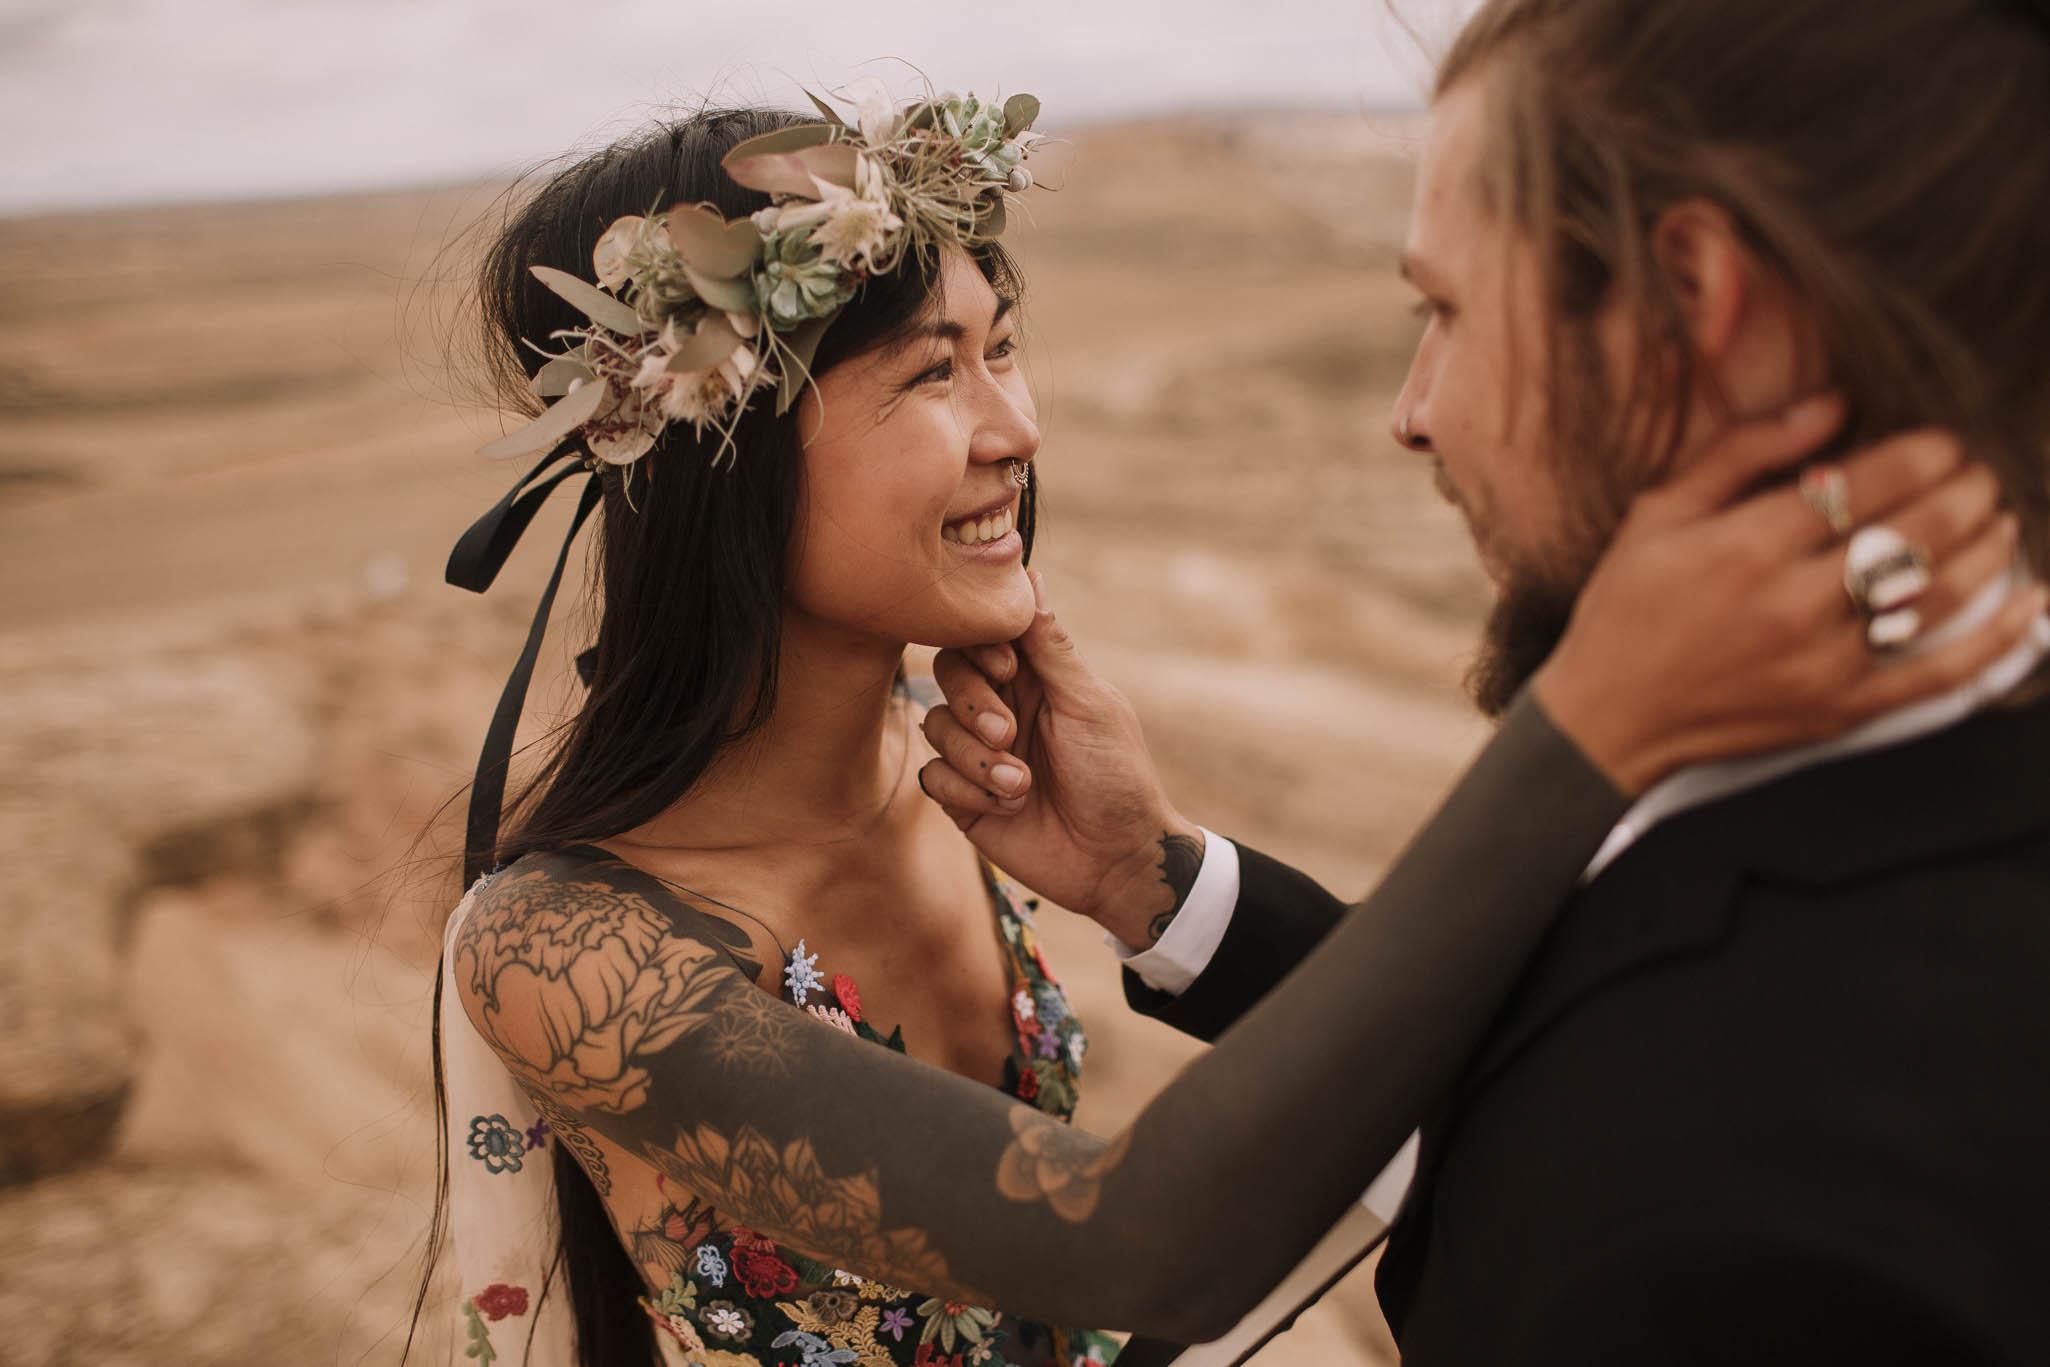 Spain-wedding-photographer-bardenas-reales-jeremy-boyer-photographe-mariage-bordeaux-floral-wedding-dress-robe-102.jpg